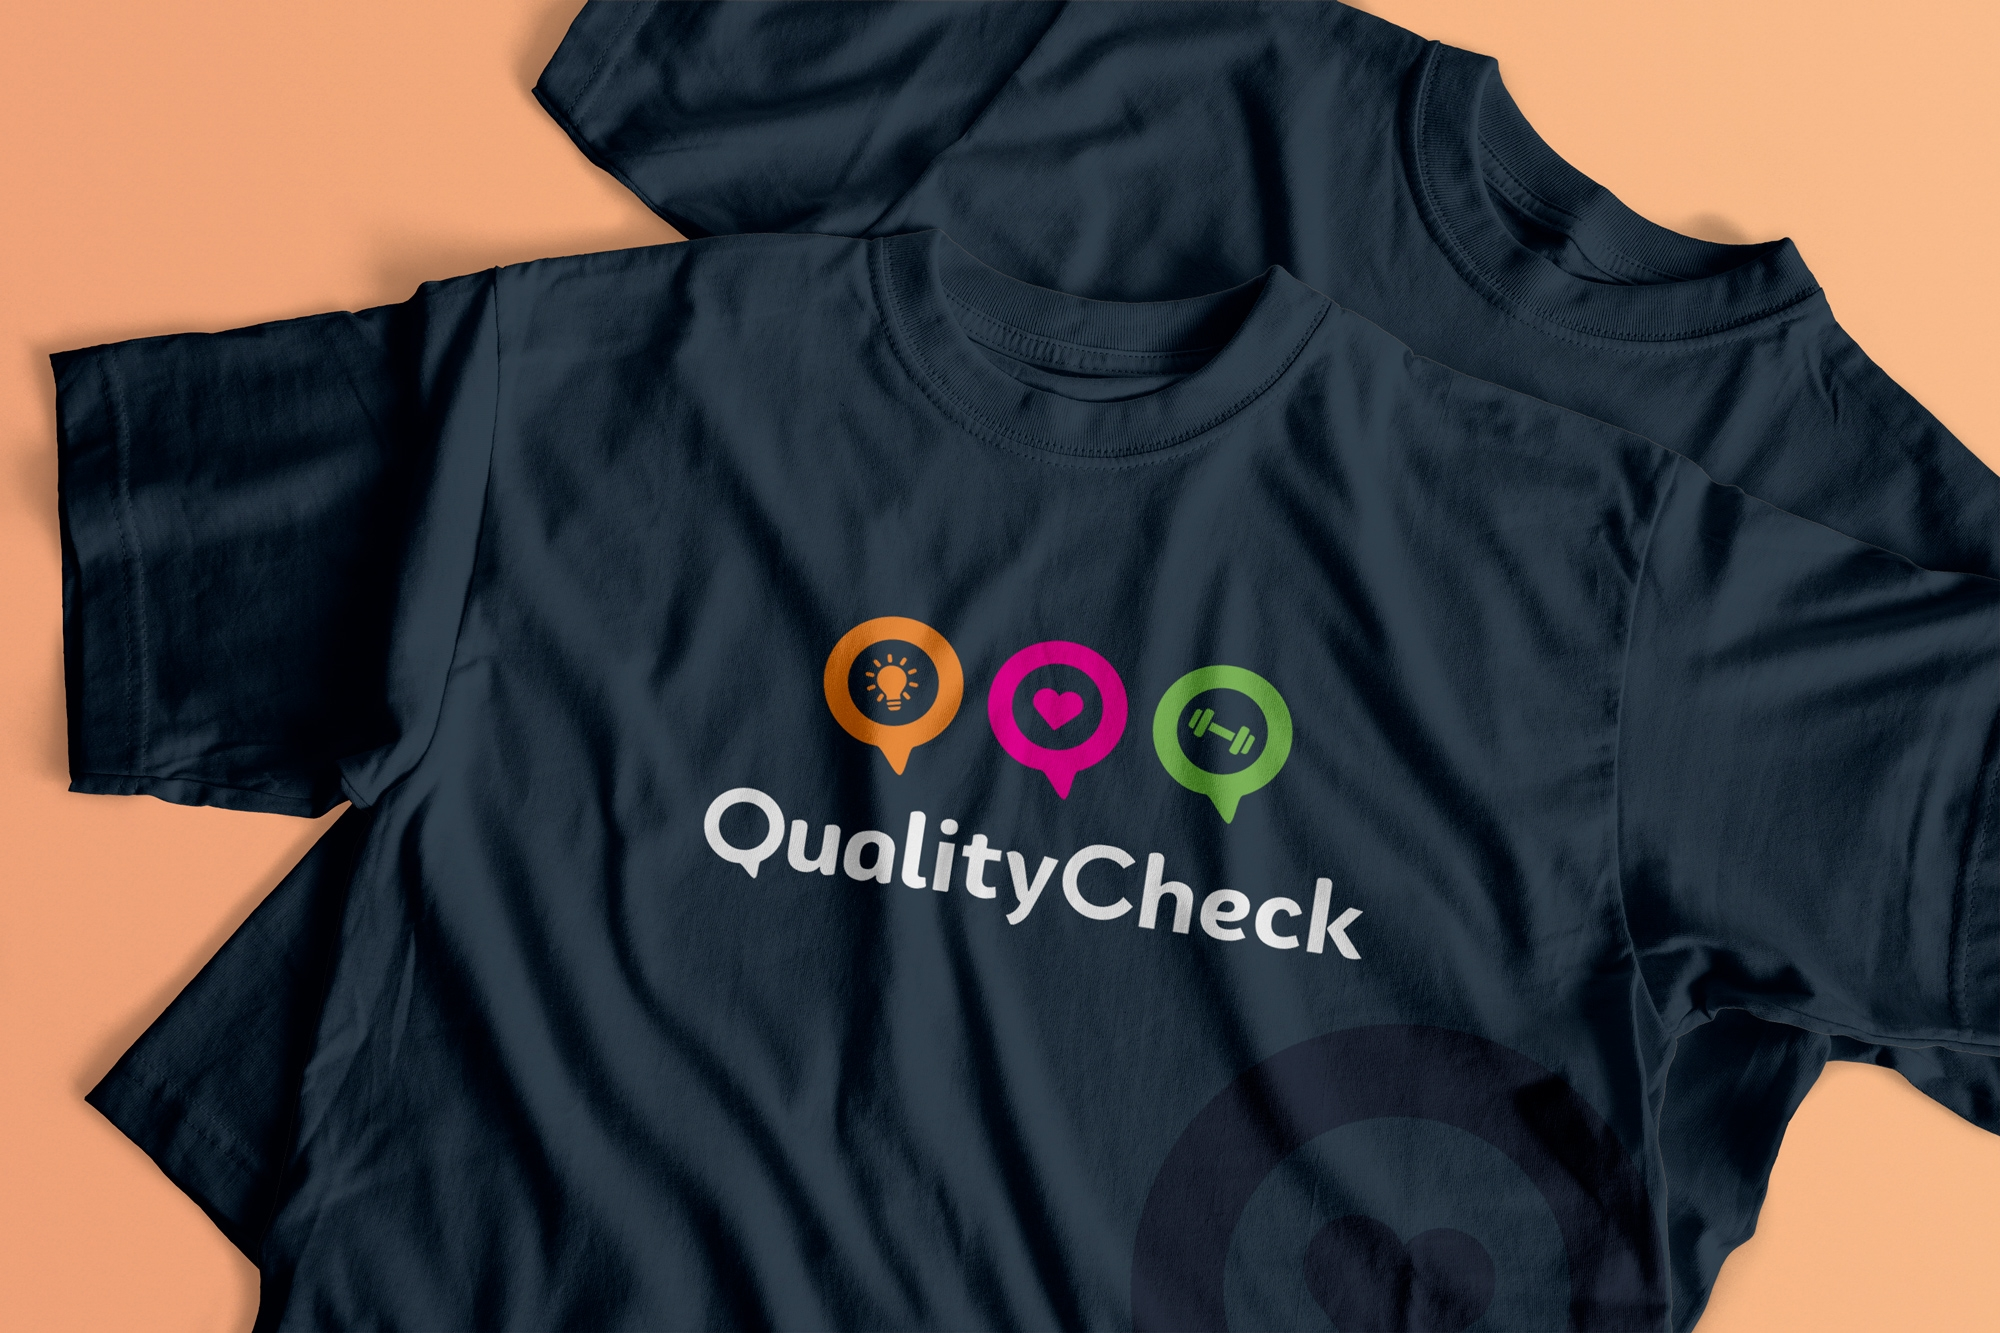 Quality Check T-shirt